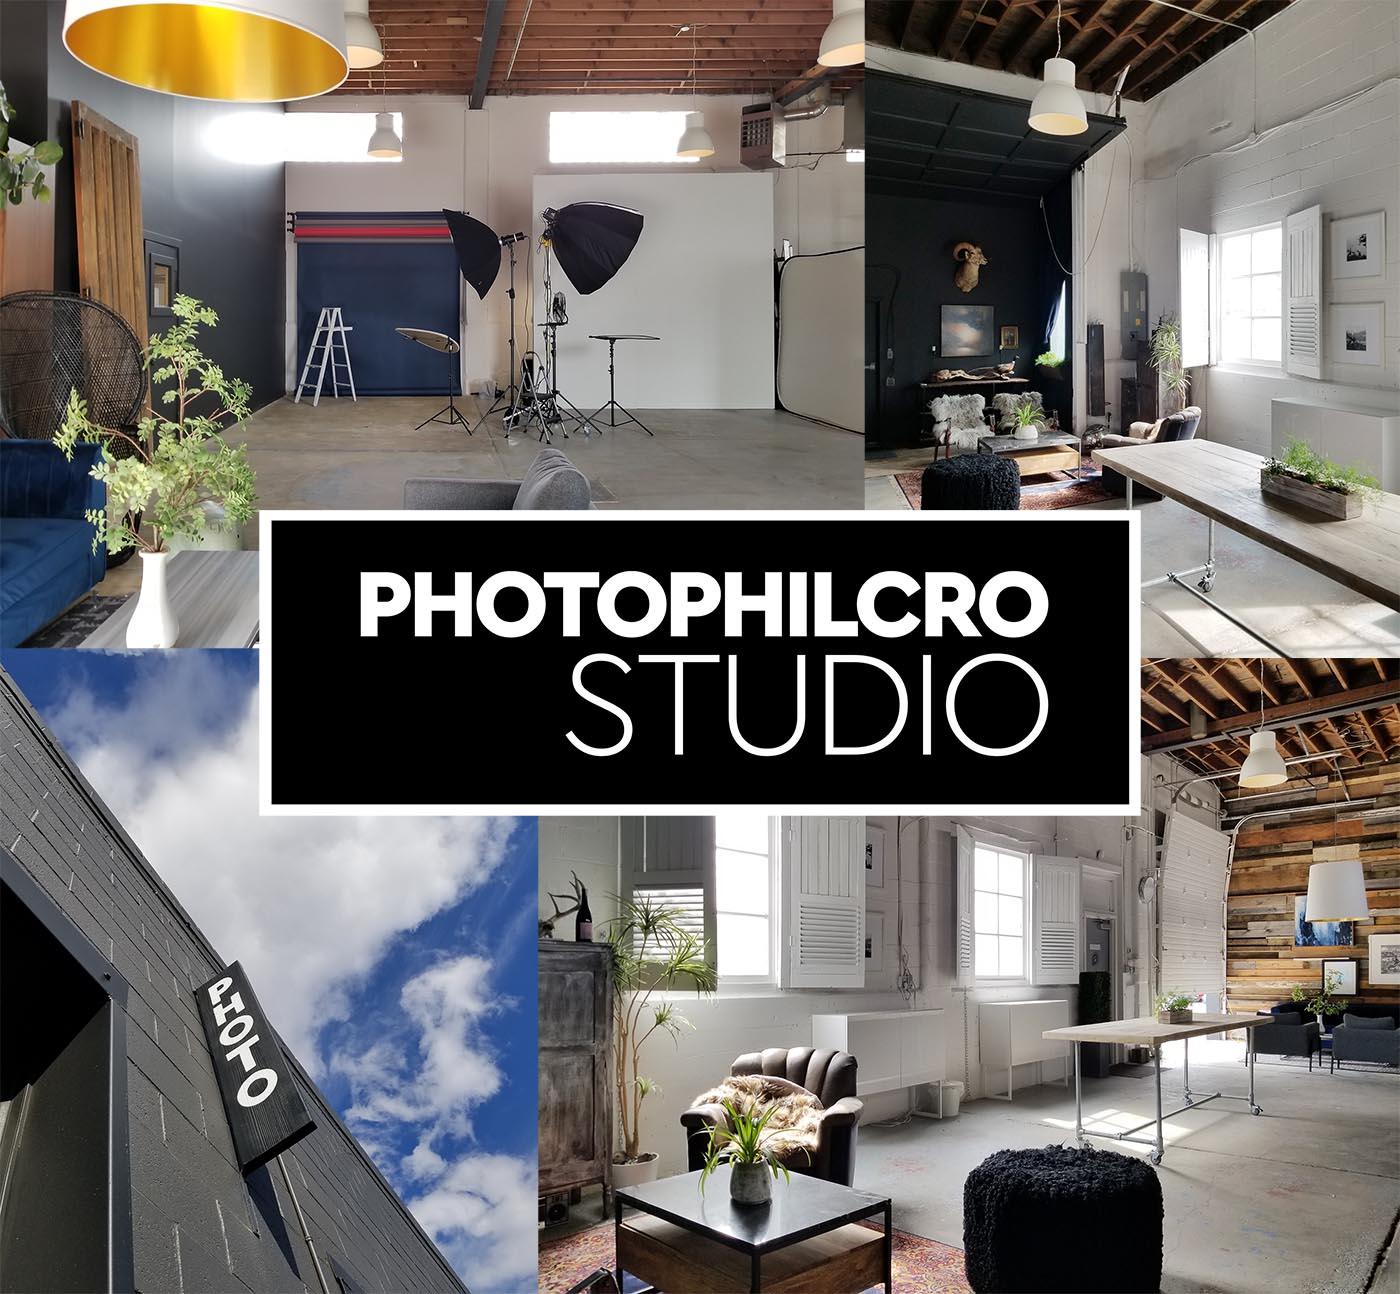 PhotophilcroStudio_Interior_webres.jpg